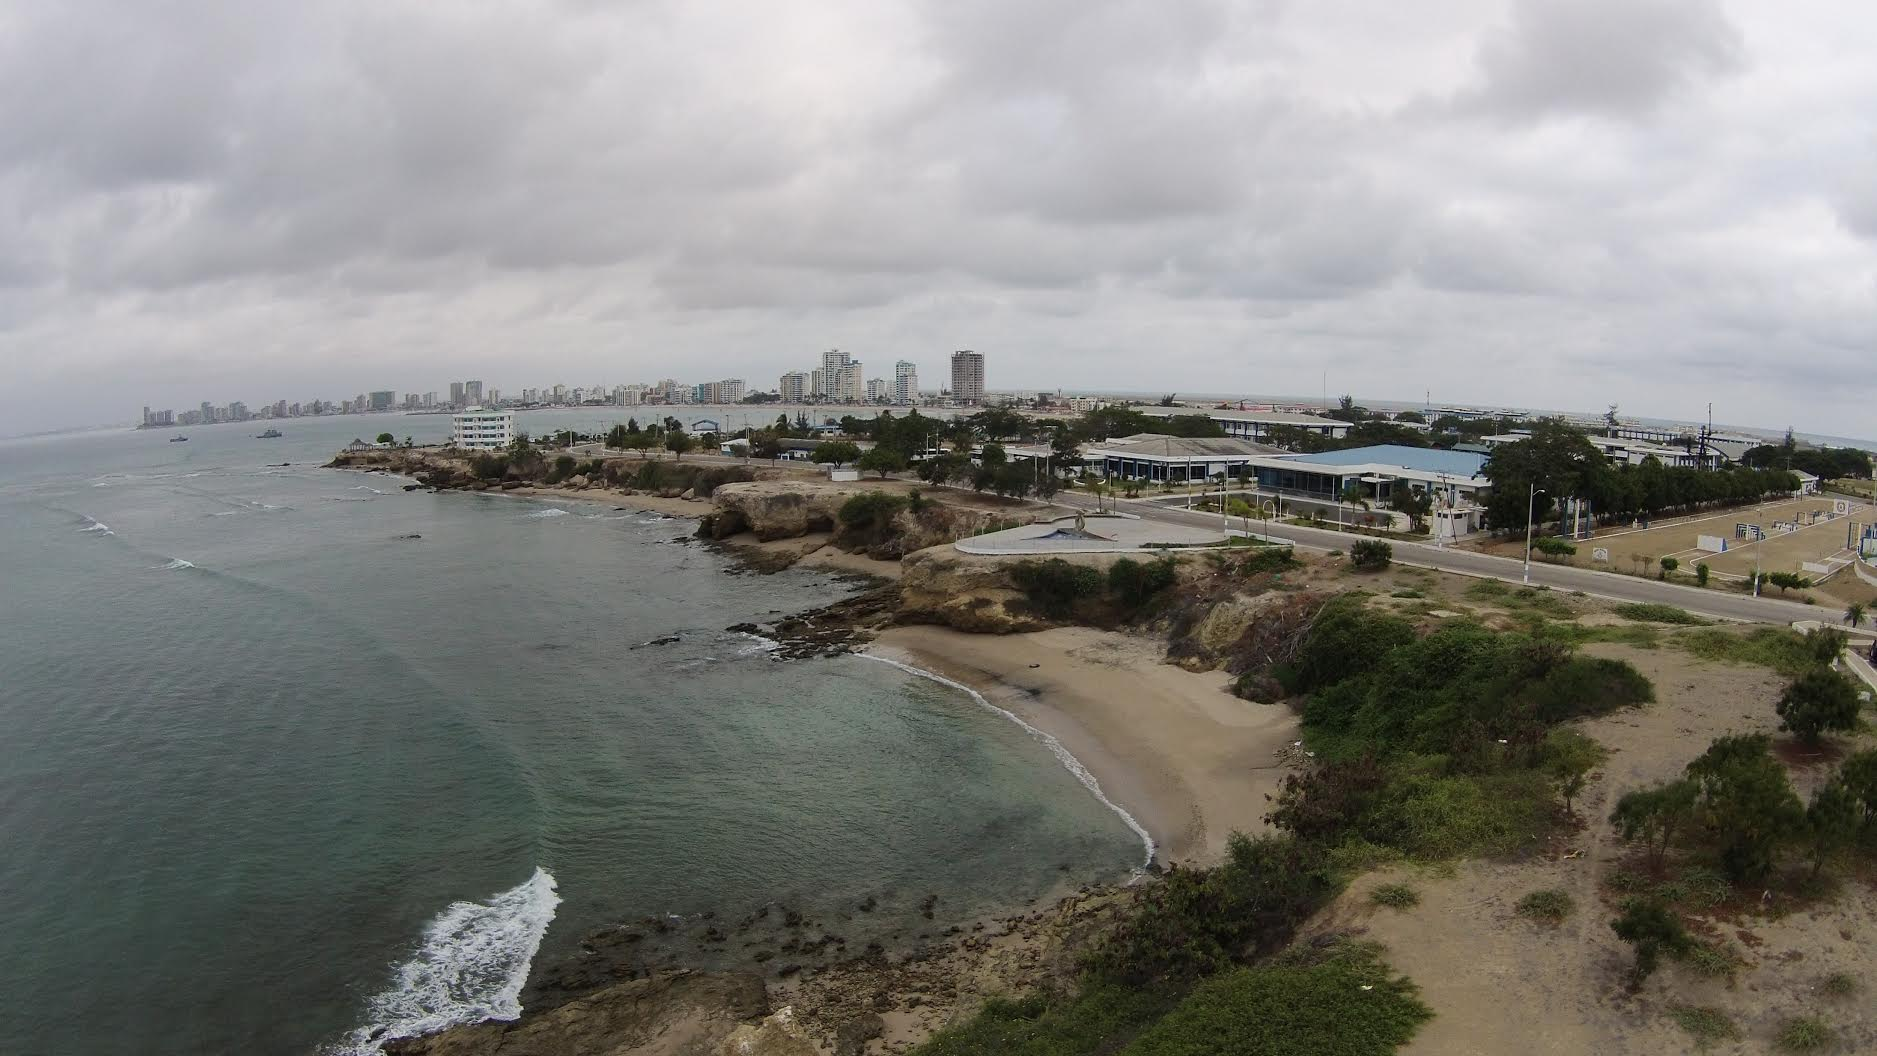 Foto: Puerto Lucia Yacht Club, Santa Elena